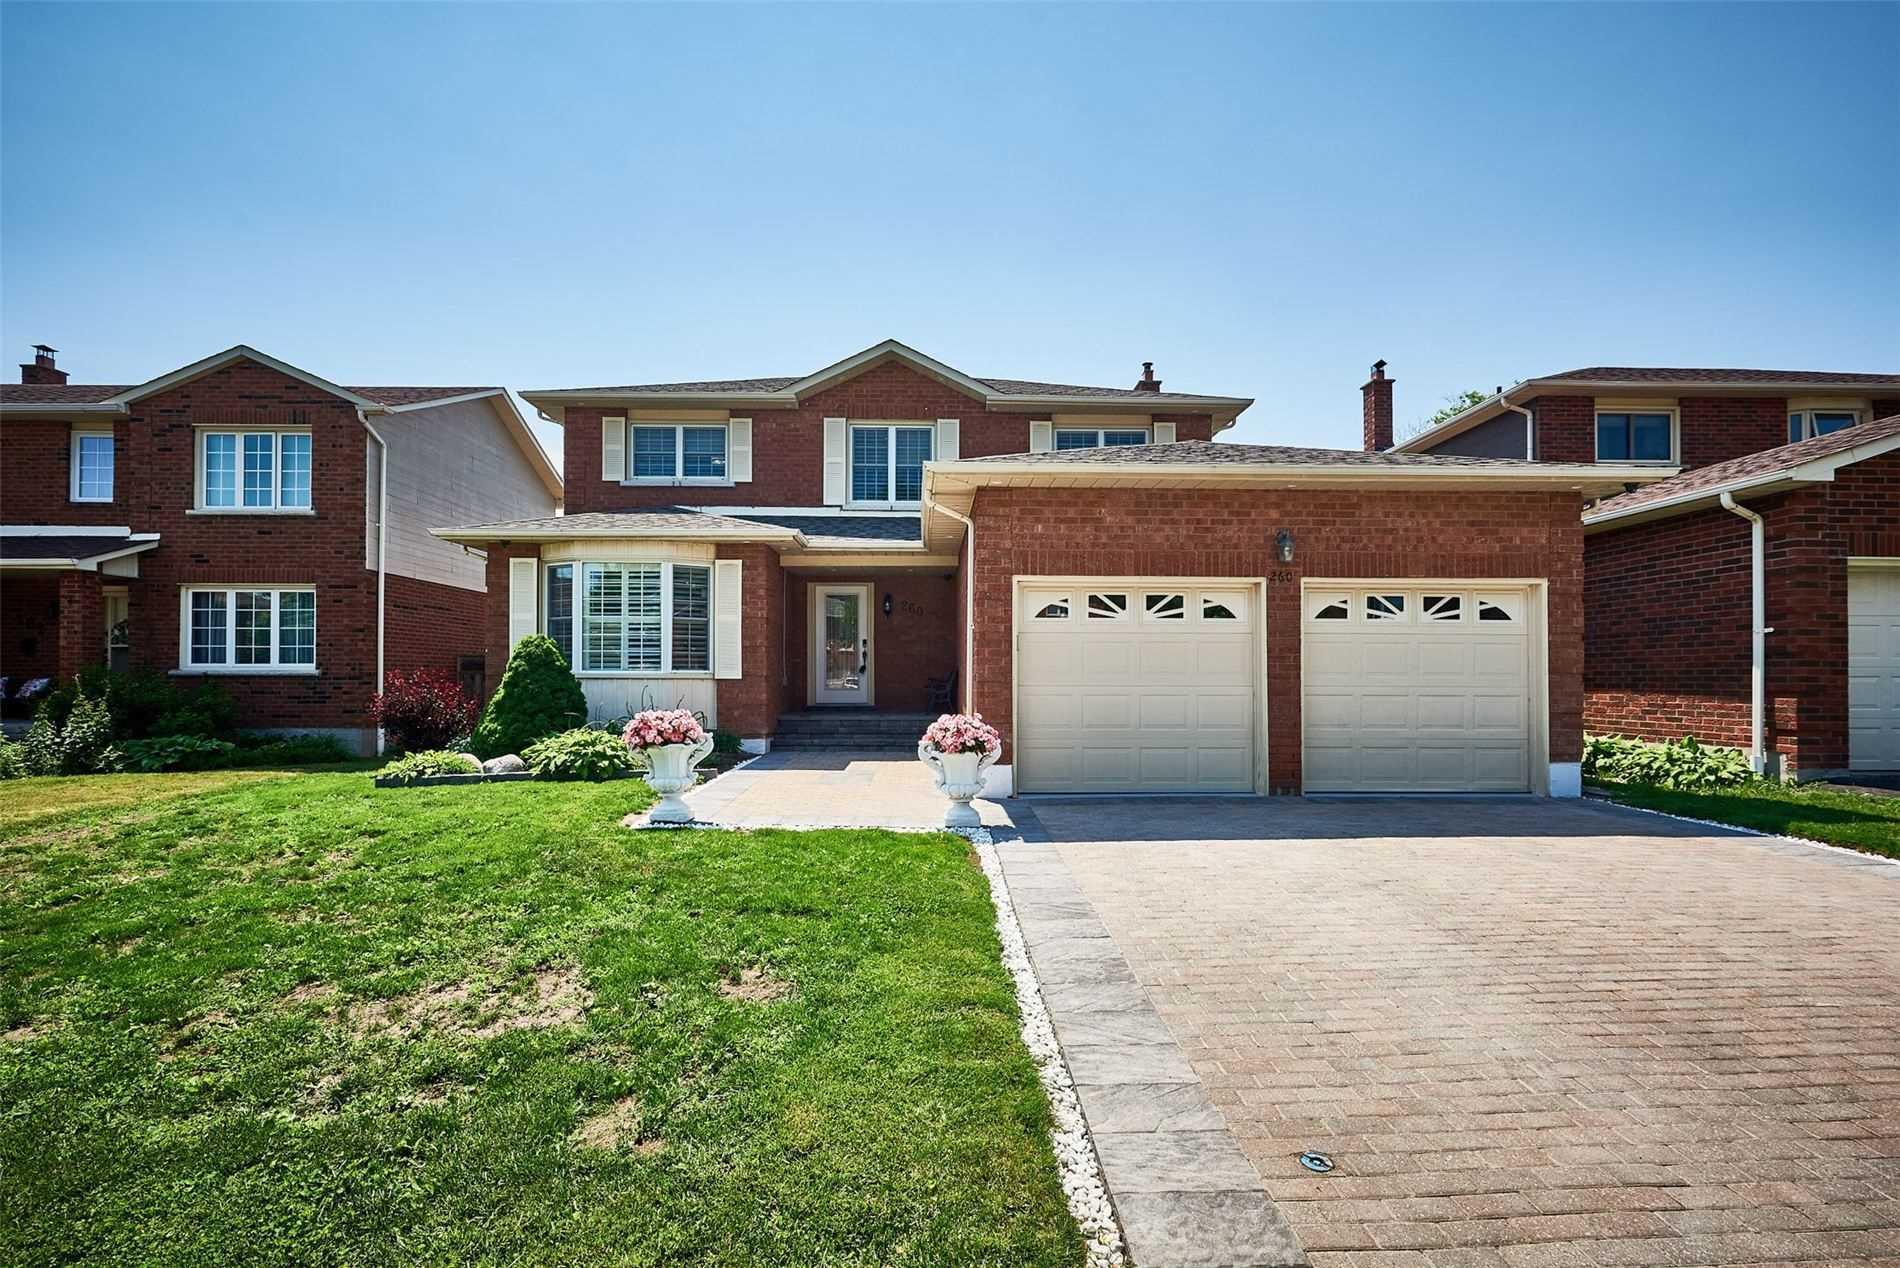 260 Glen Hill Dr, Whitby, Ontario L1N7J8, 4 Bedrooms Bedrooms, ,4 BathroomsBathrooms,Detached,For Sale,Glen Hill,E5272323